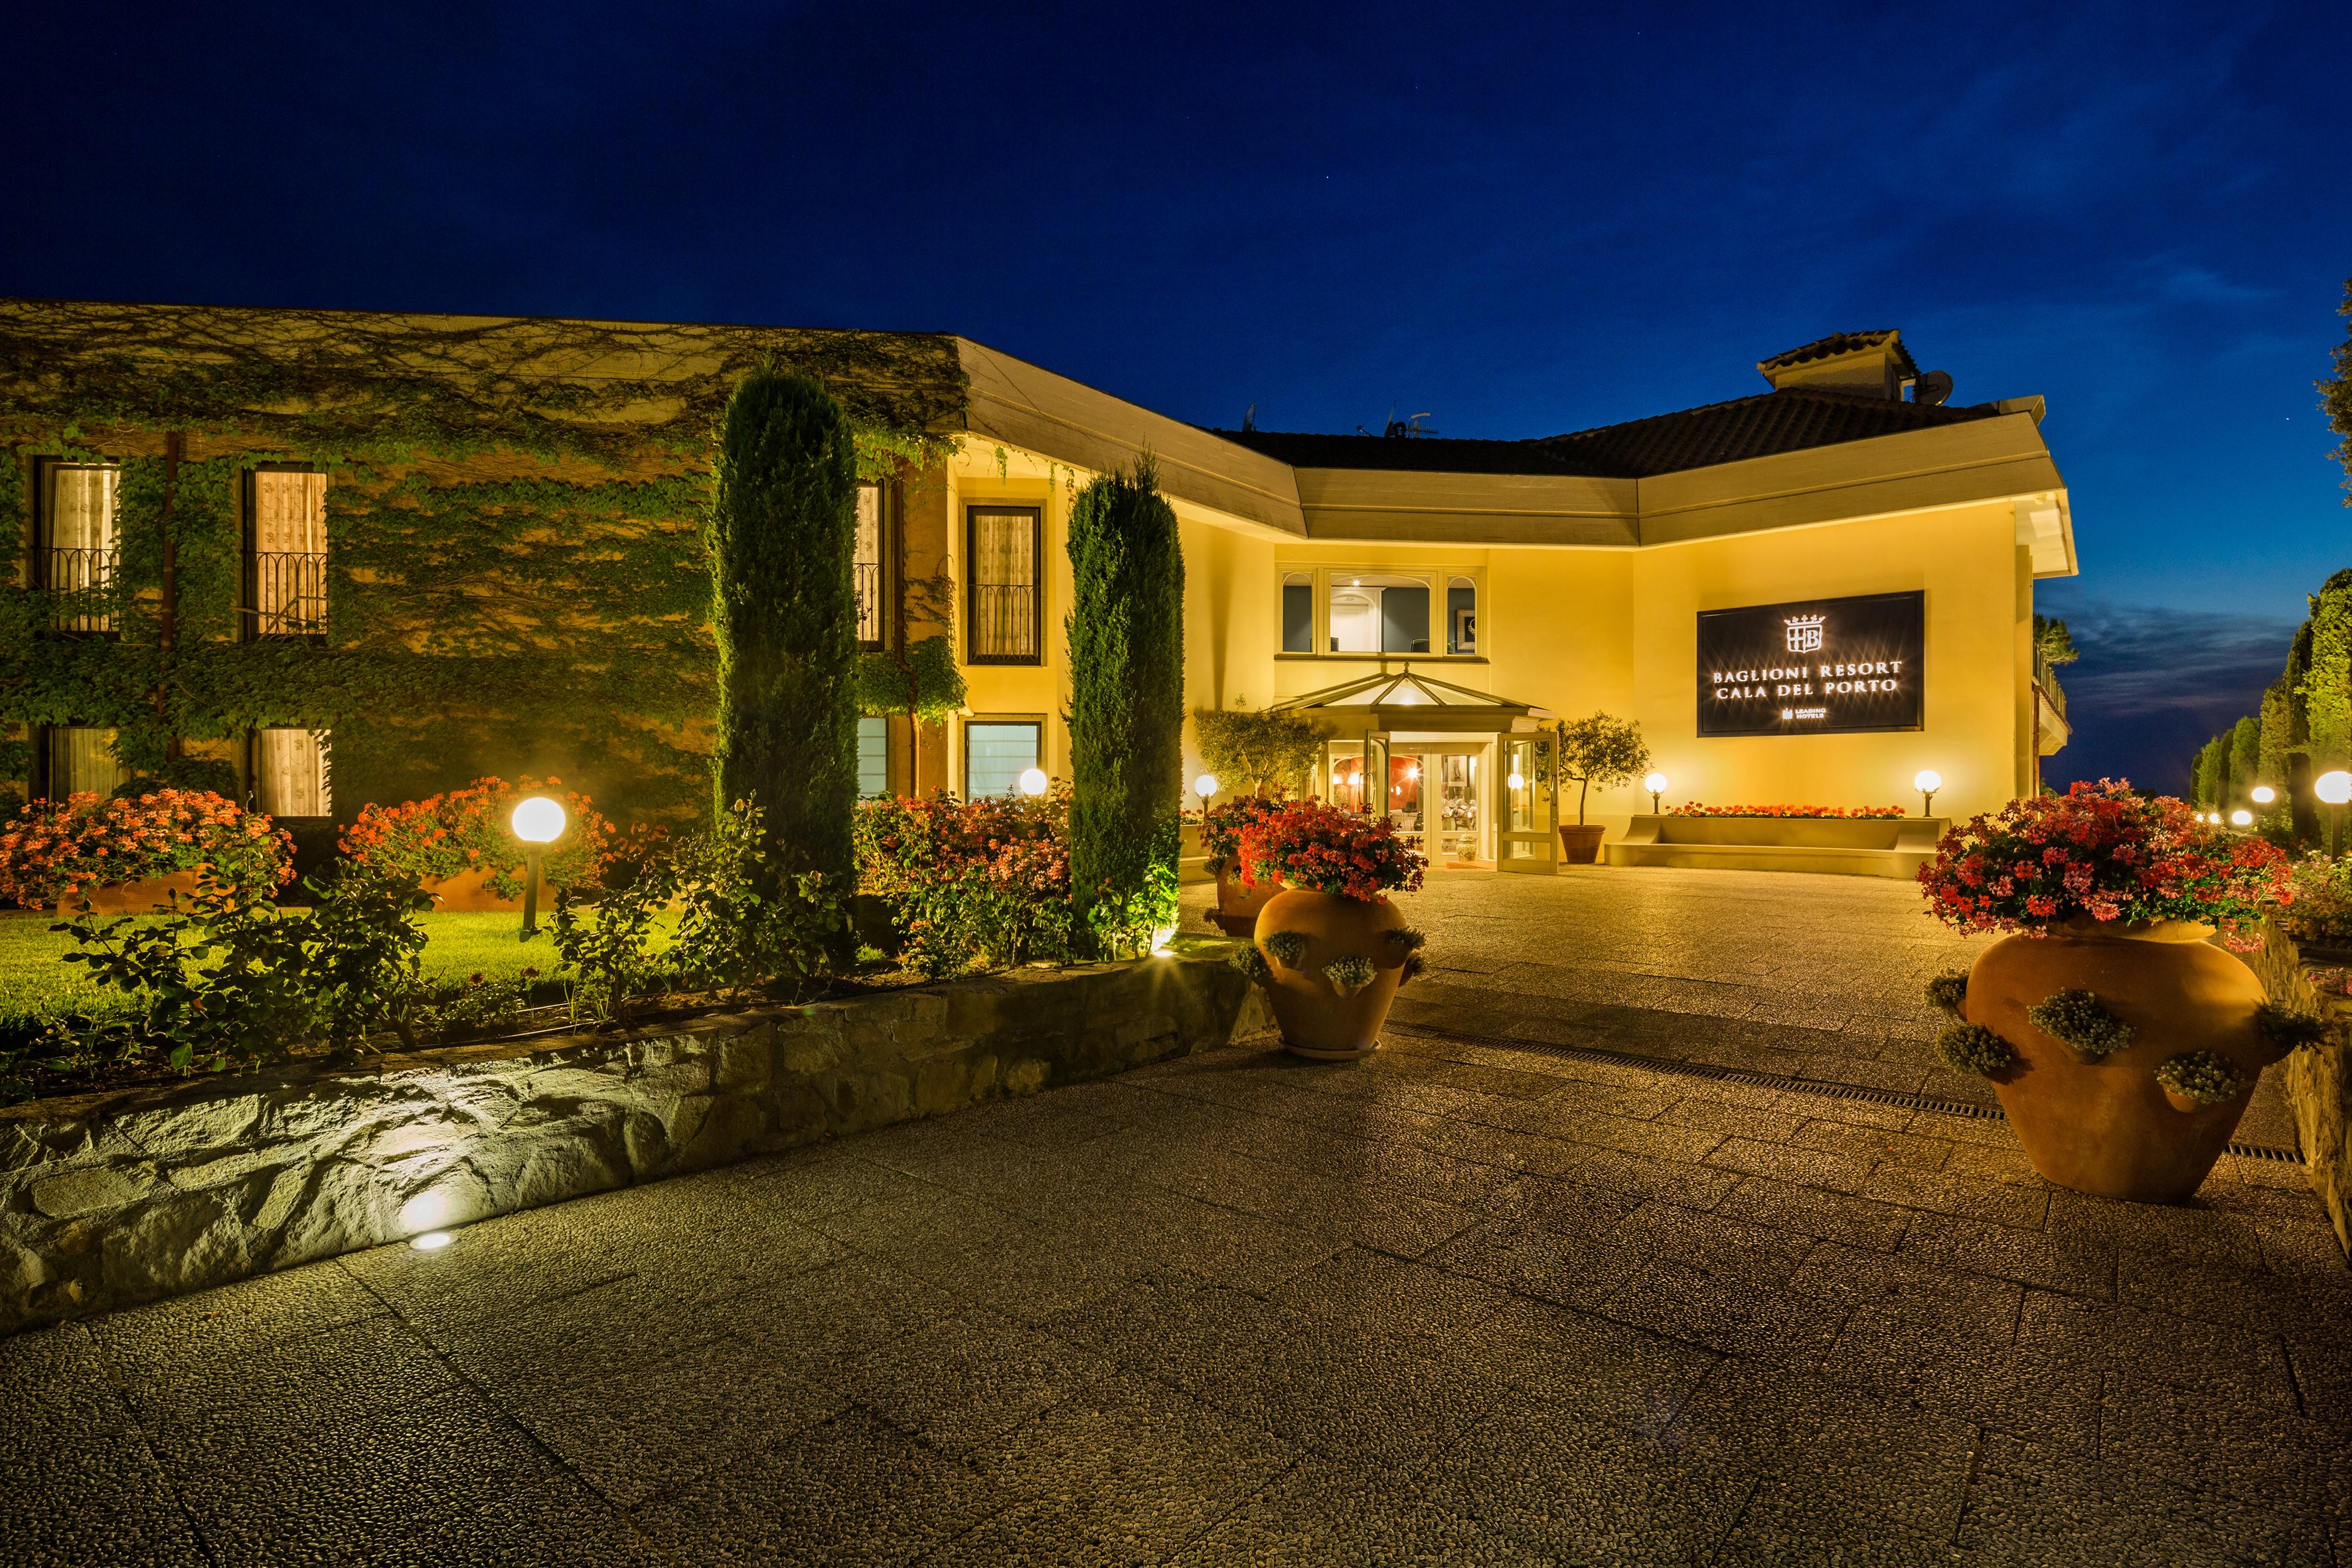 4_Baglioni_Resort_Cala_Del_Porto_Exterior_1®DiegoDePol.jpg